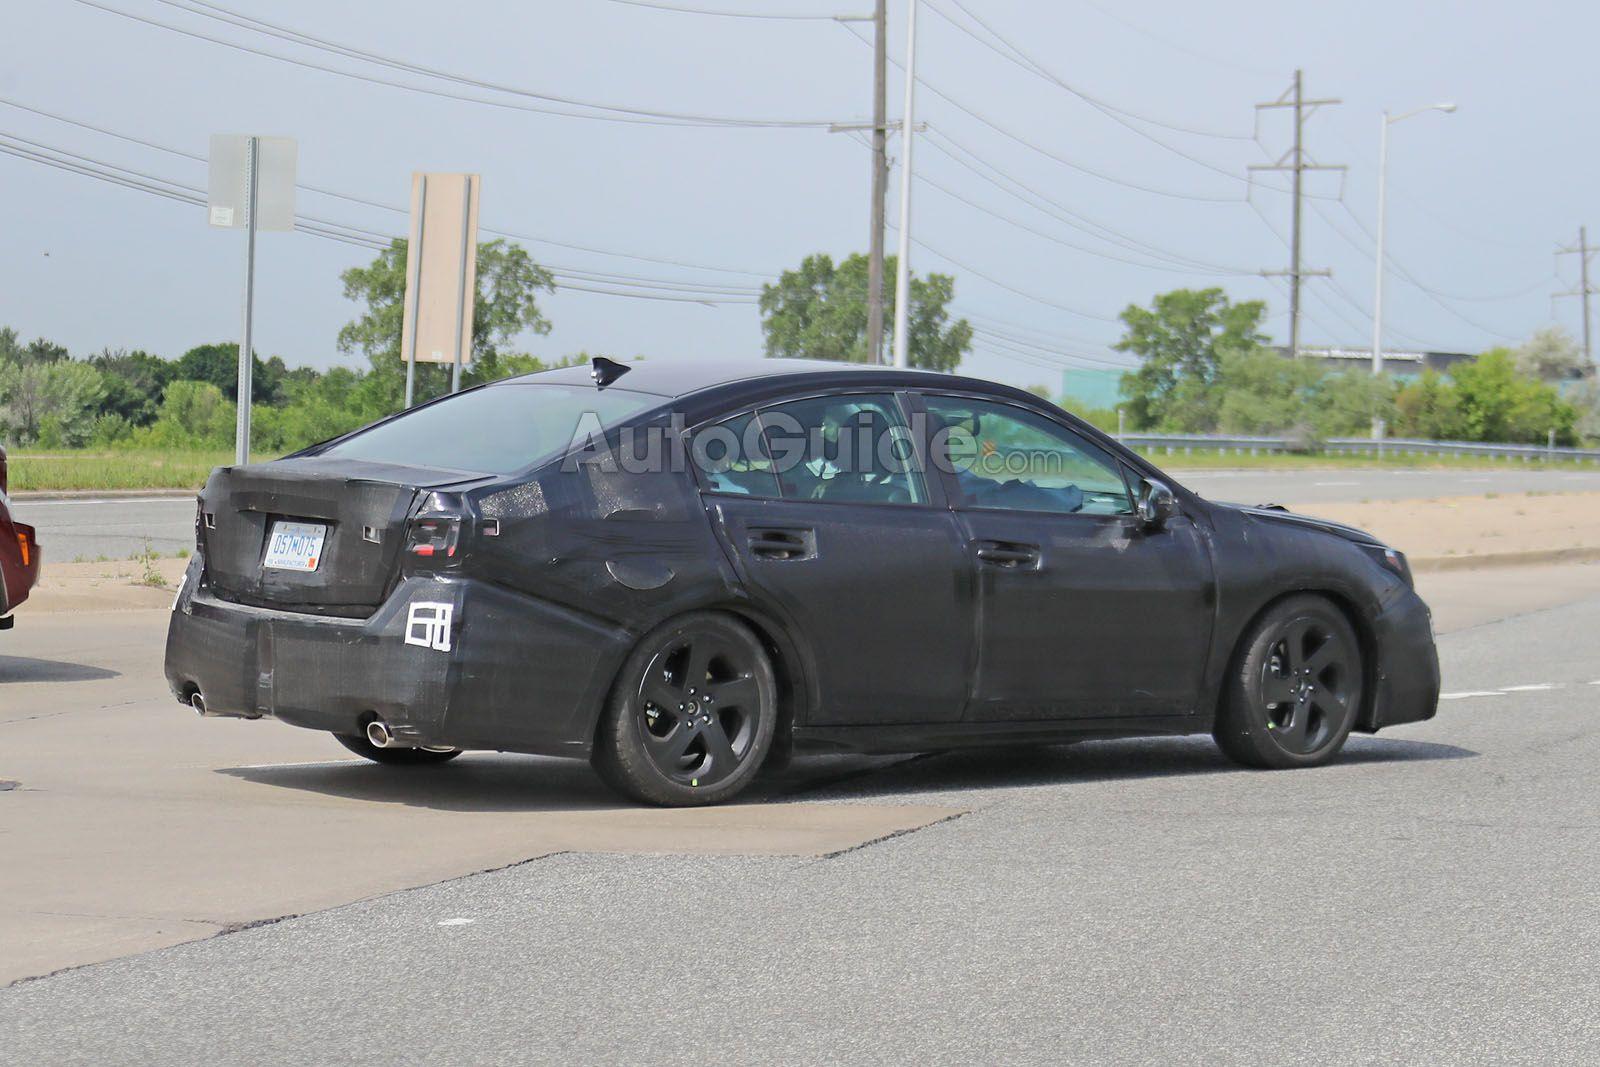 2020 Subaru Legacy 2020 Subaru Legacy, 2020 subaru